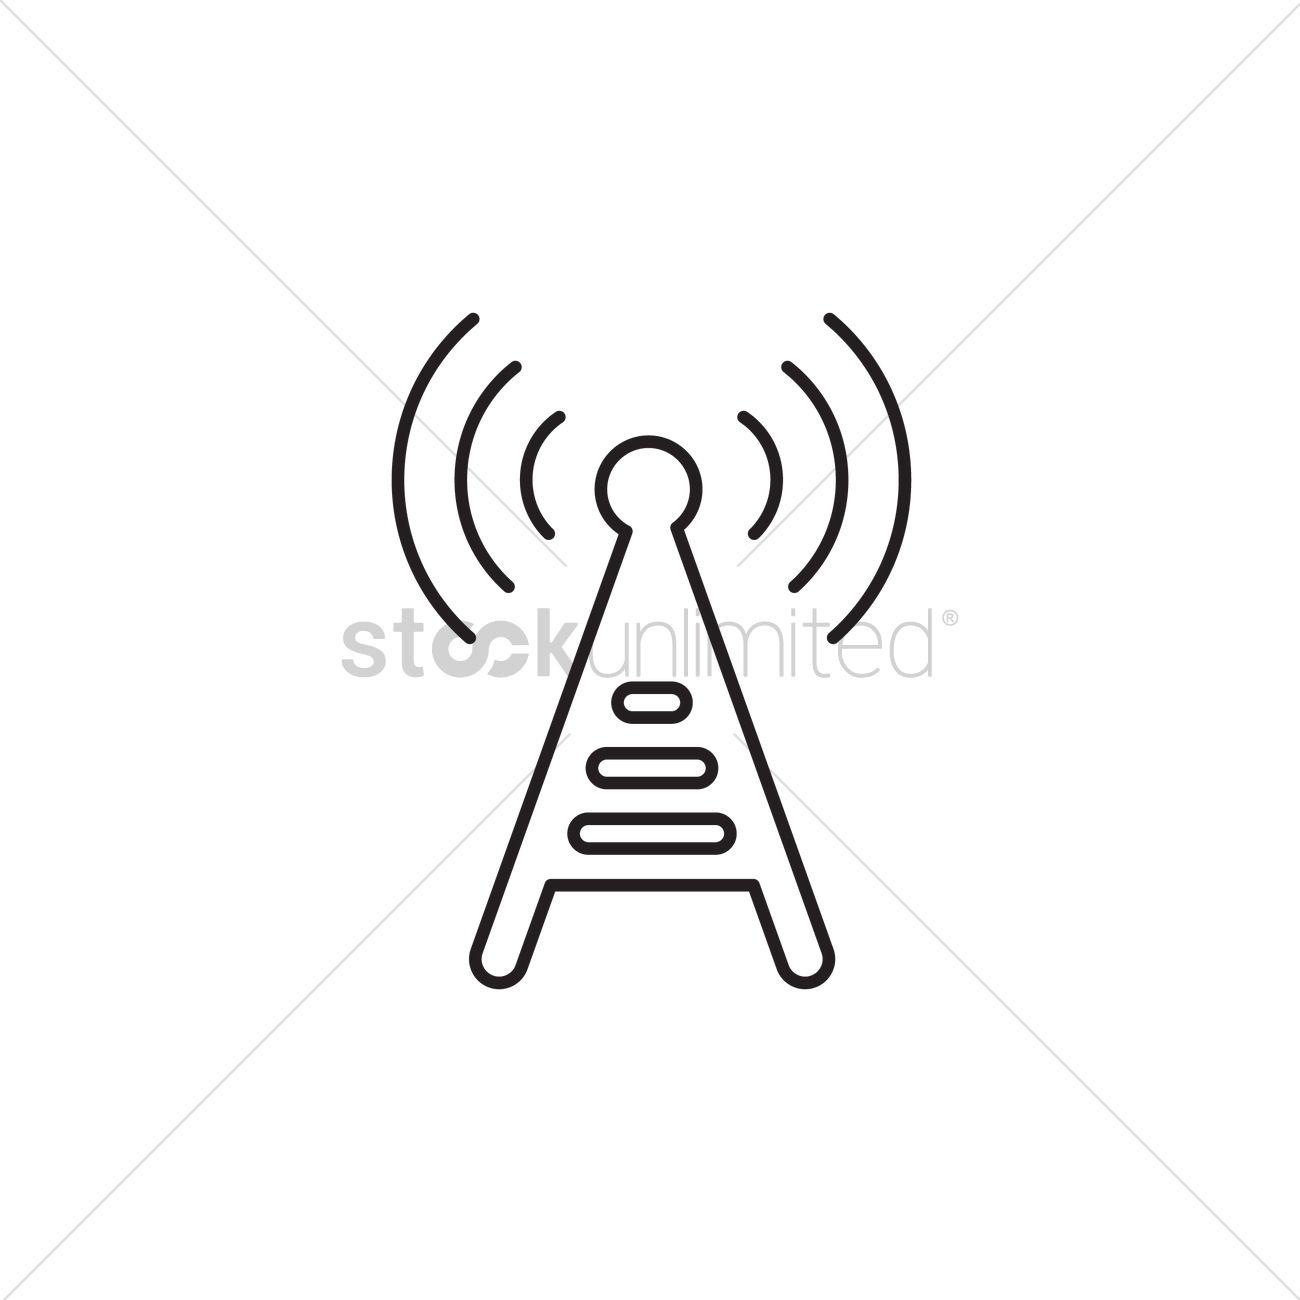 Radio tower Vector Image - 1293750 | StockUnlimited